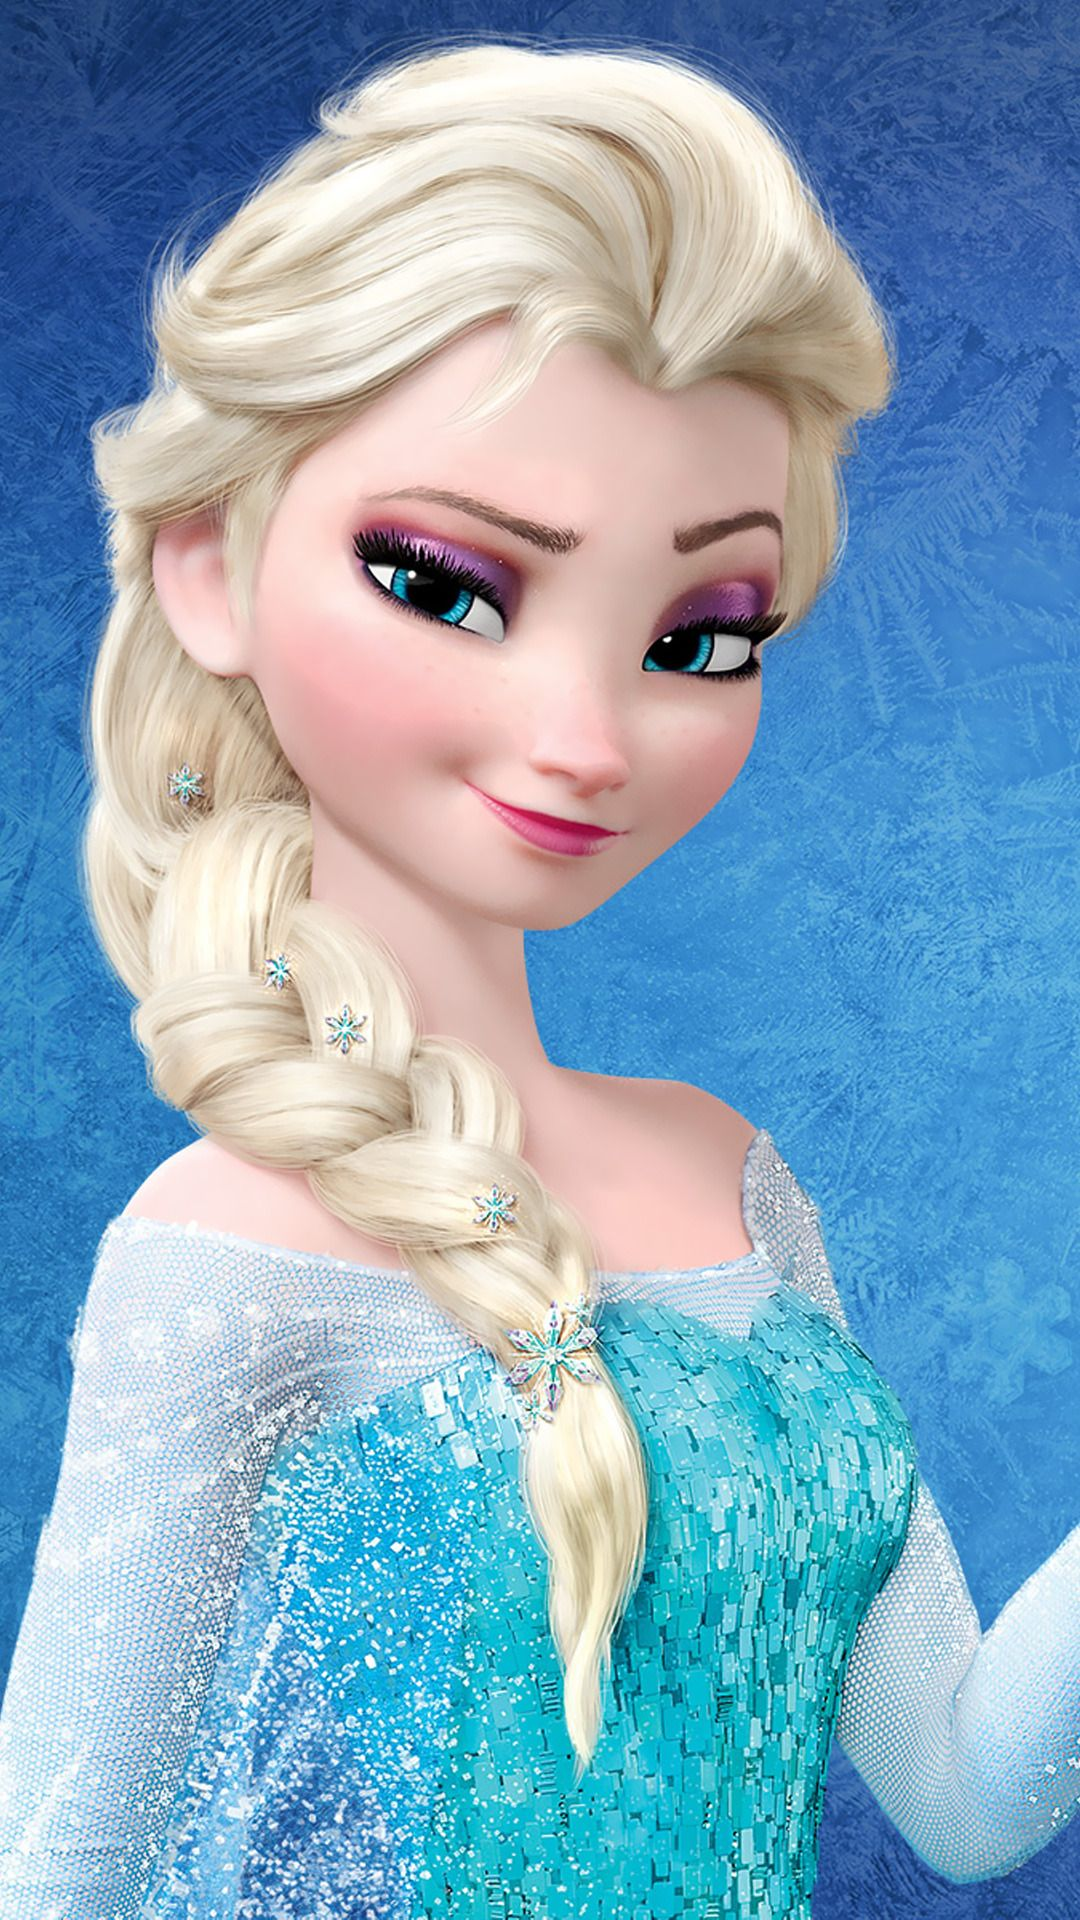 disney pixar has made a whole new princess problem | pinterest